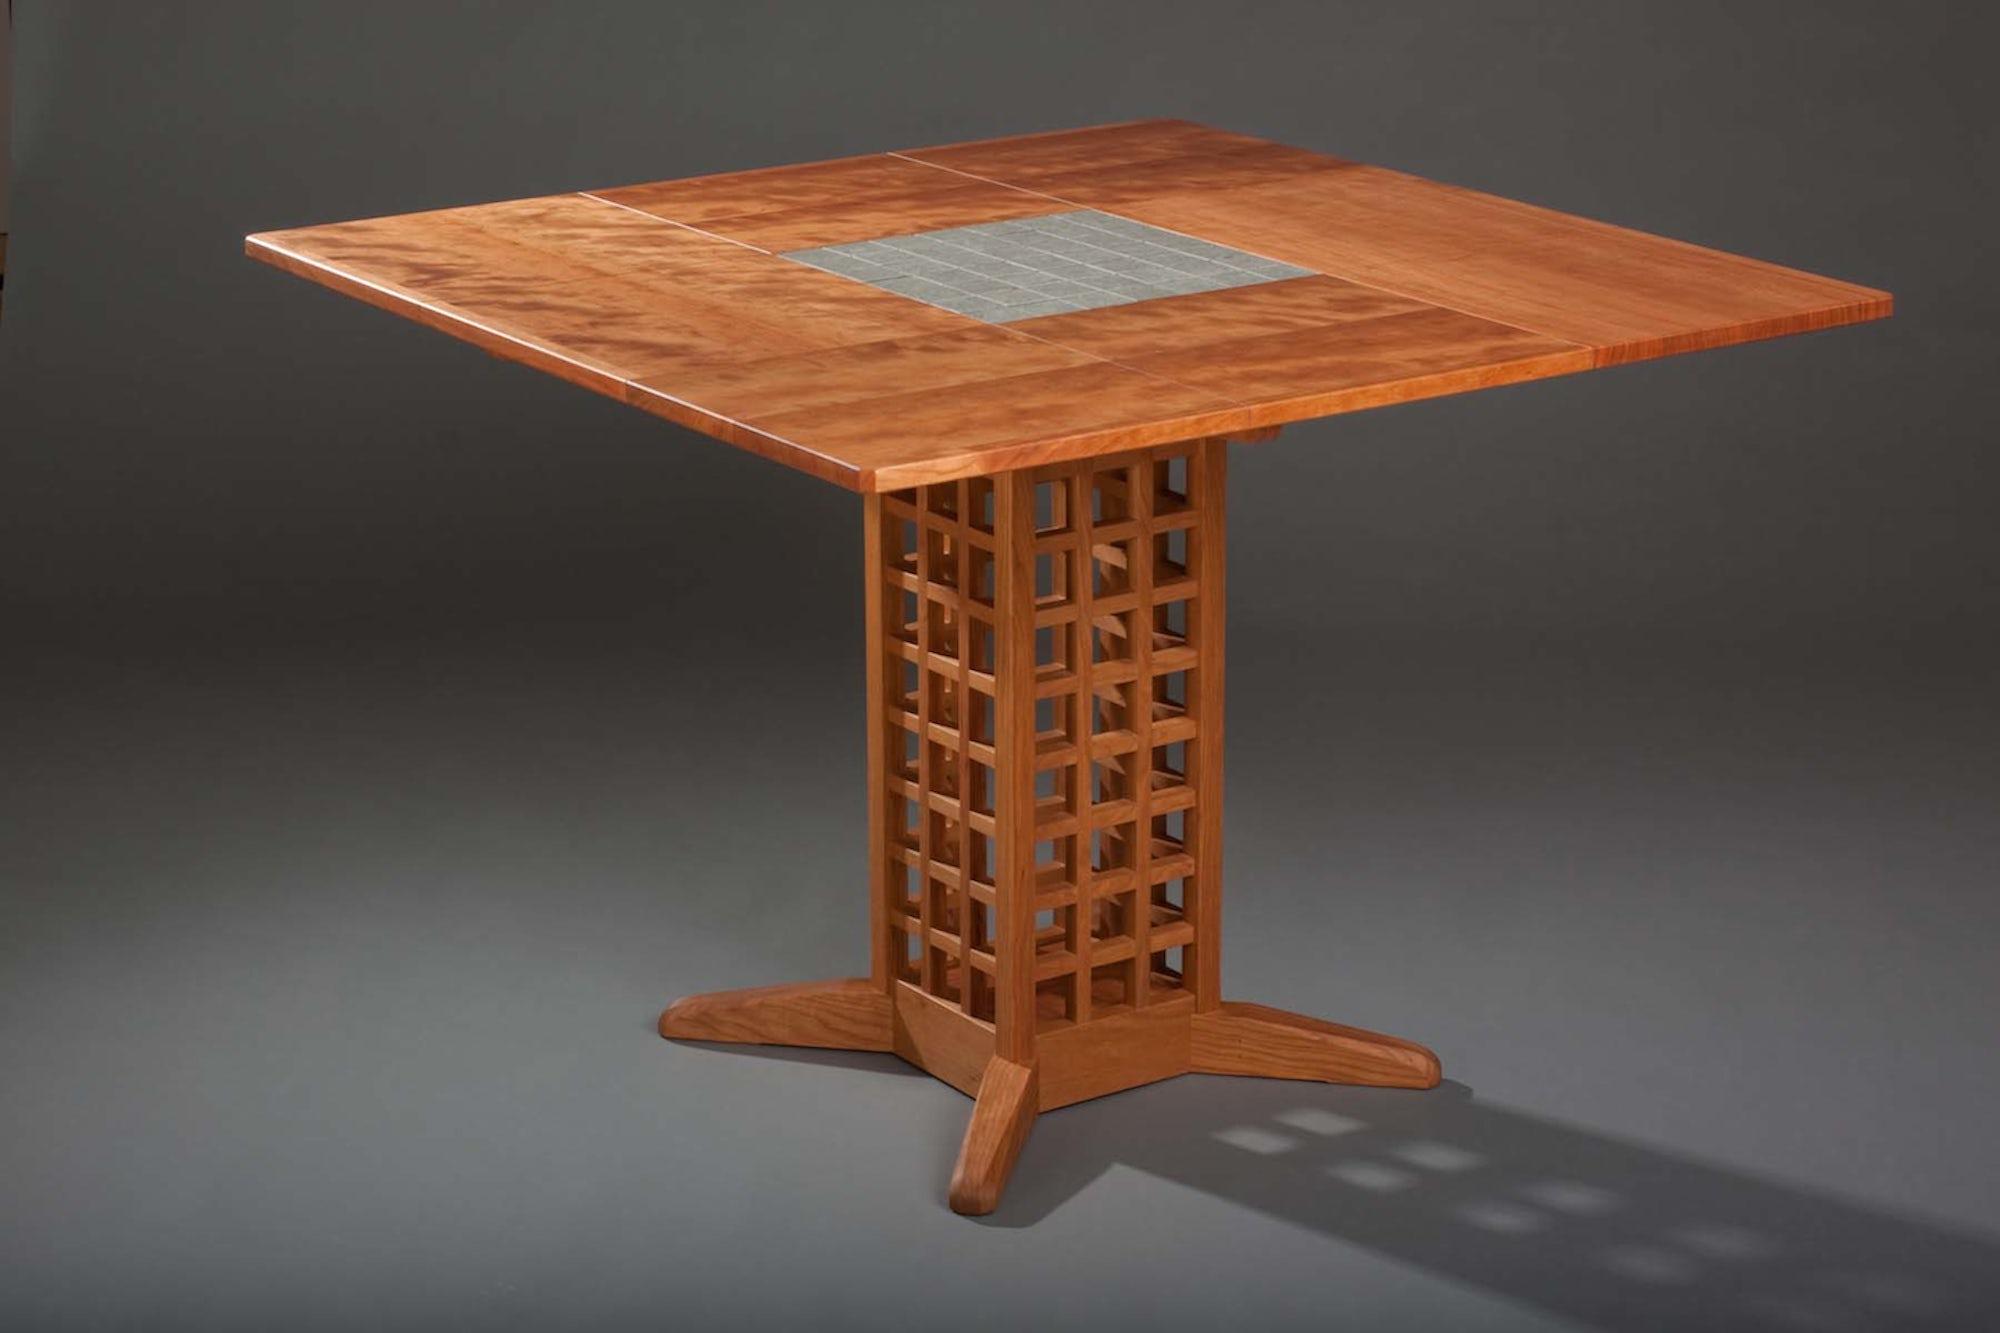 Cafe-table-1800jpegweb